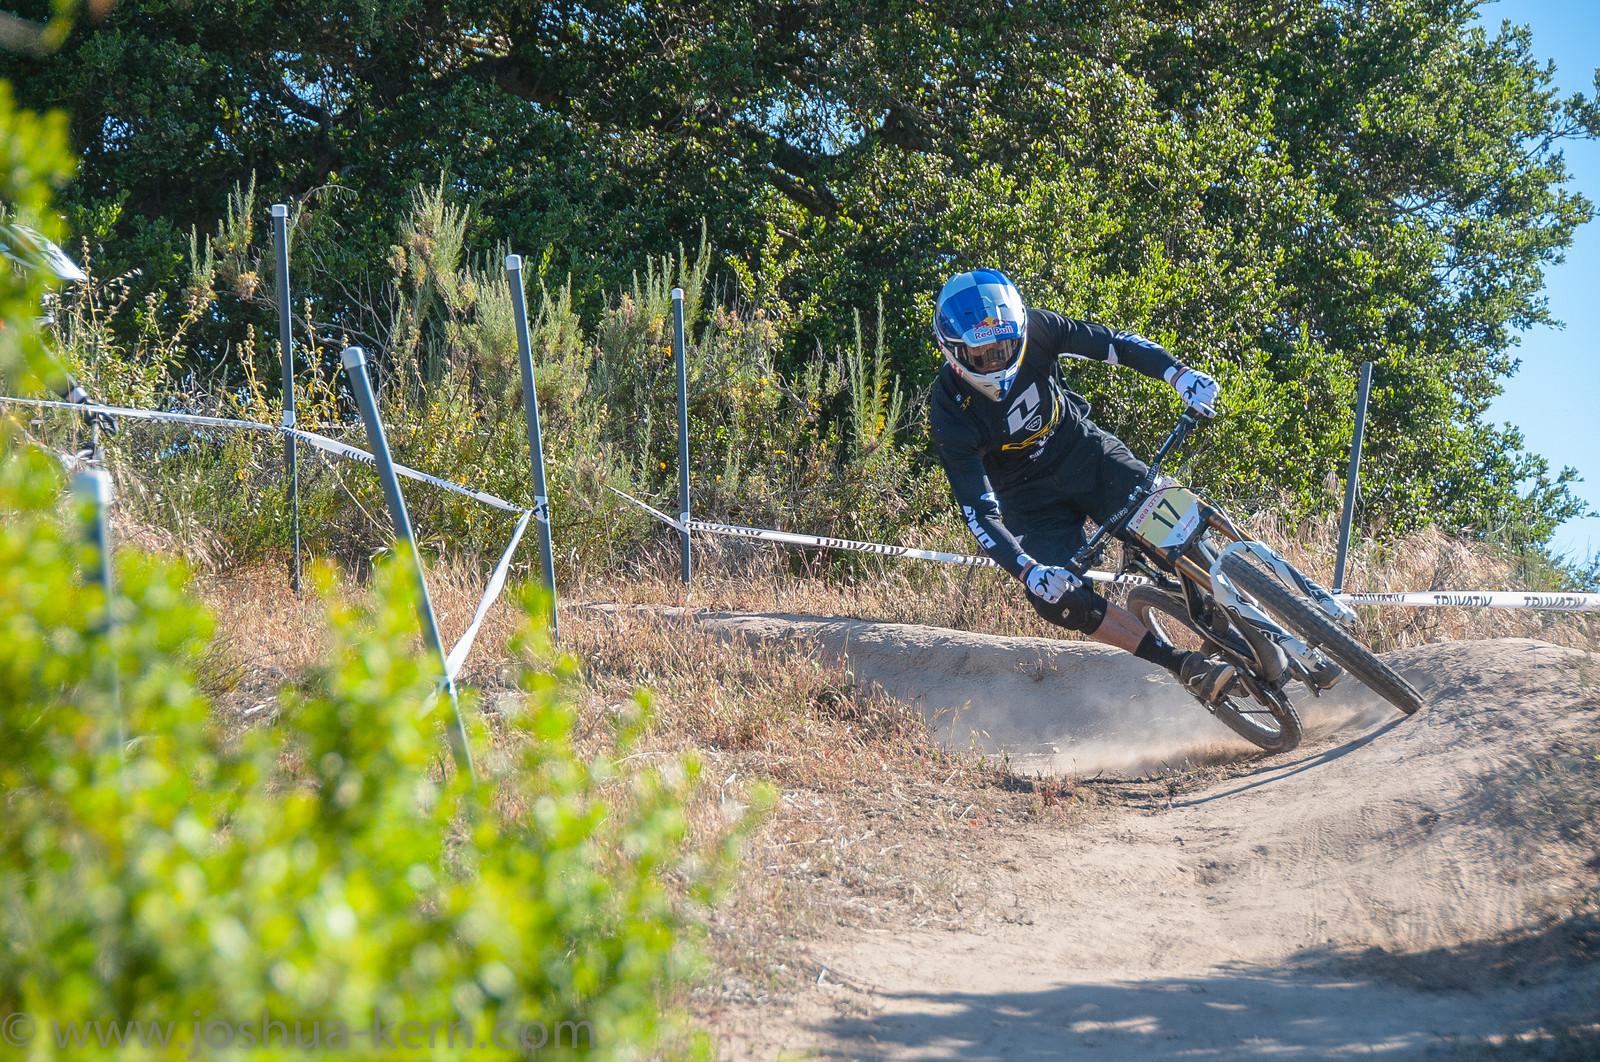 4-18-13DHPractice (8 of 17) - jkern620 - Mountain Biking Pictures - Vital MTB